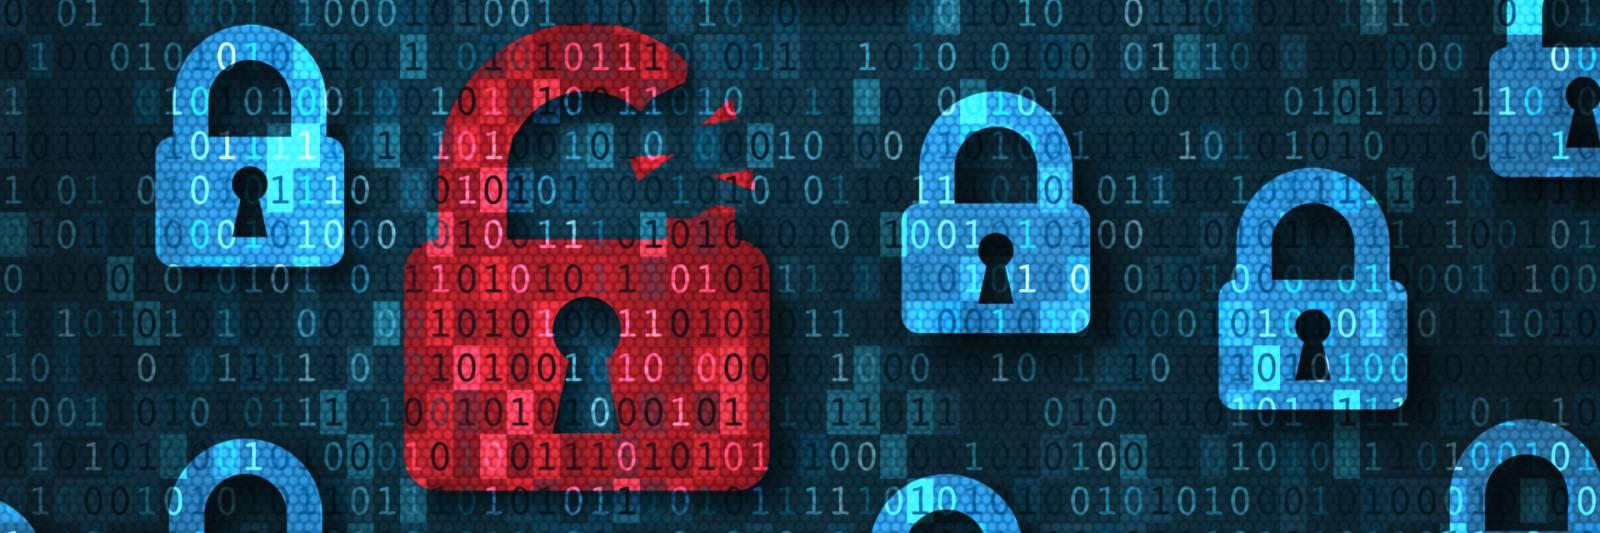 Weekly Threat Roundup: Zero Days In Windows, Adobe, Google Chrome